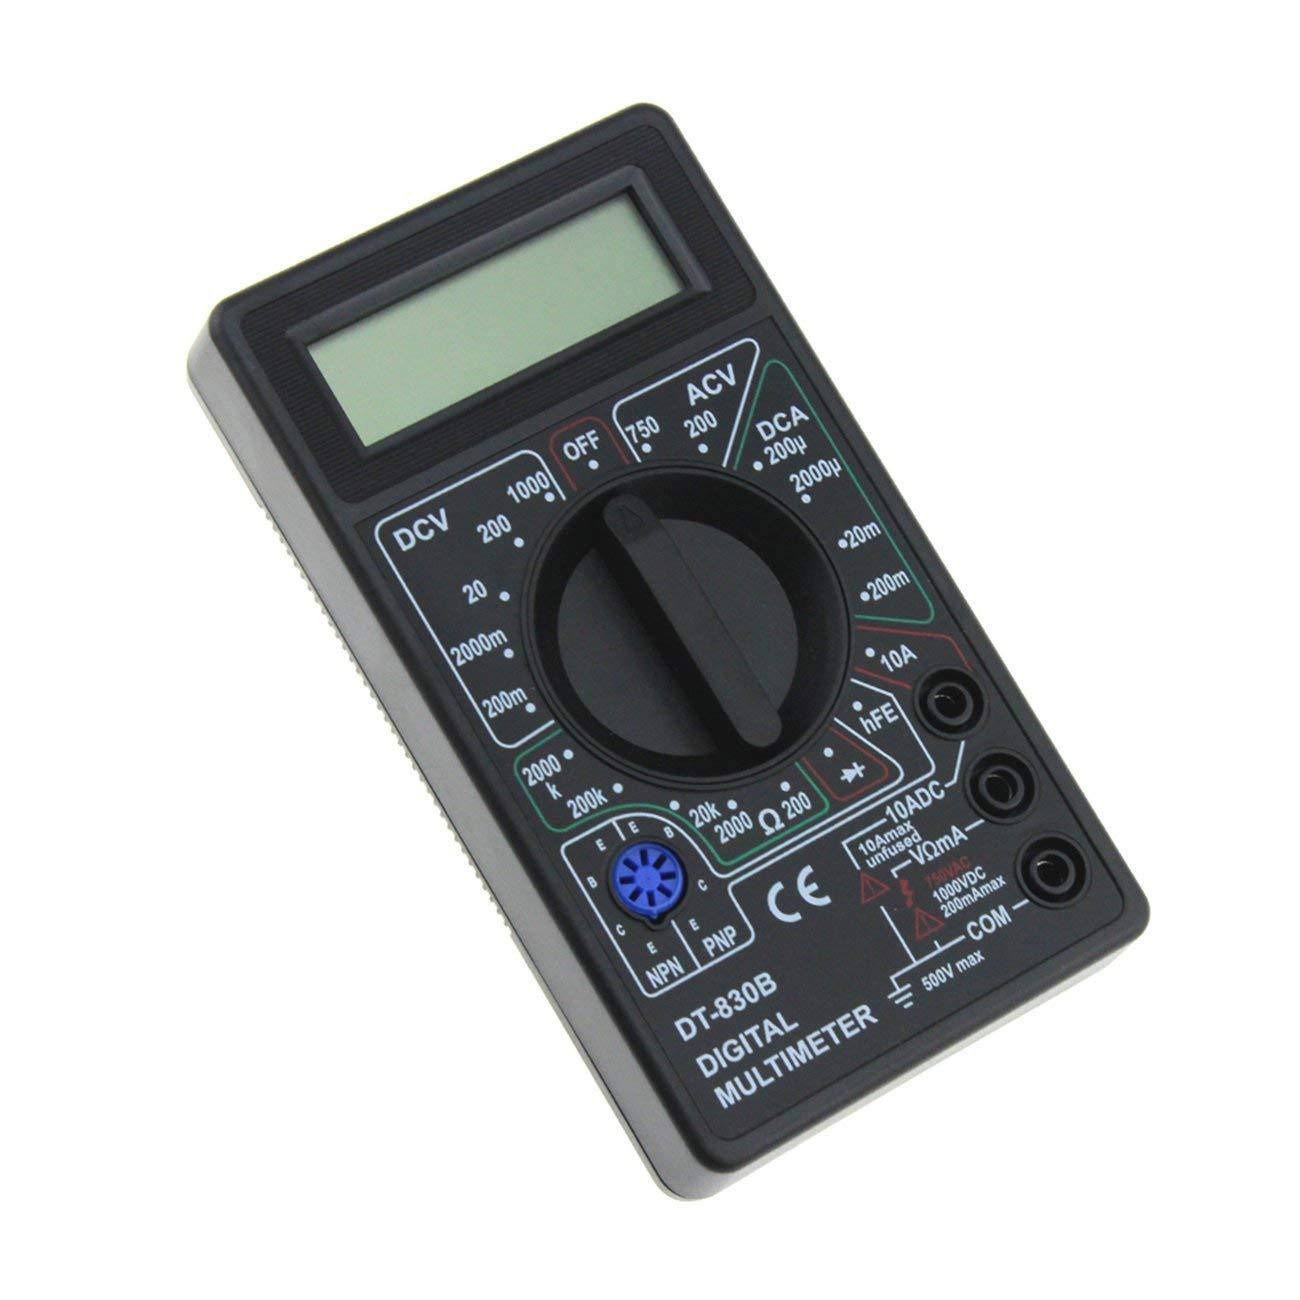 DT-830B Multimetro digitale tascabile 1999 Conteggi AC//DC Volt Amp Ohm Diodo hFE Tester Amperometro Voltmetro Ohmmeter JBP-X